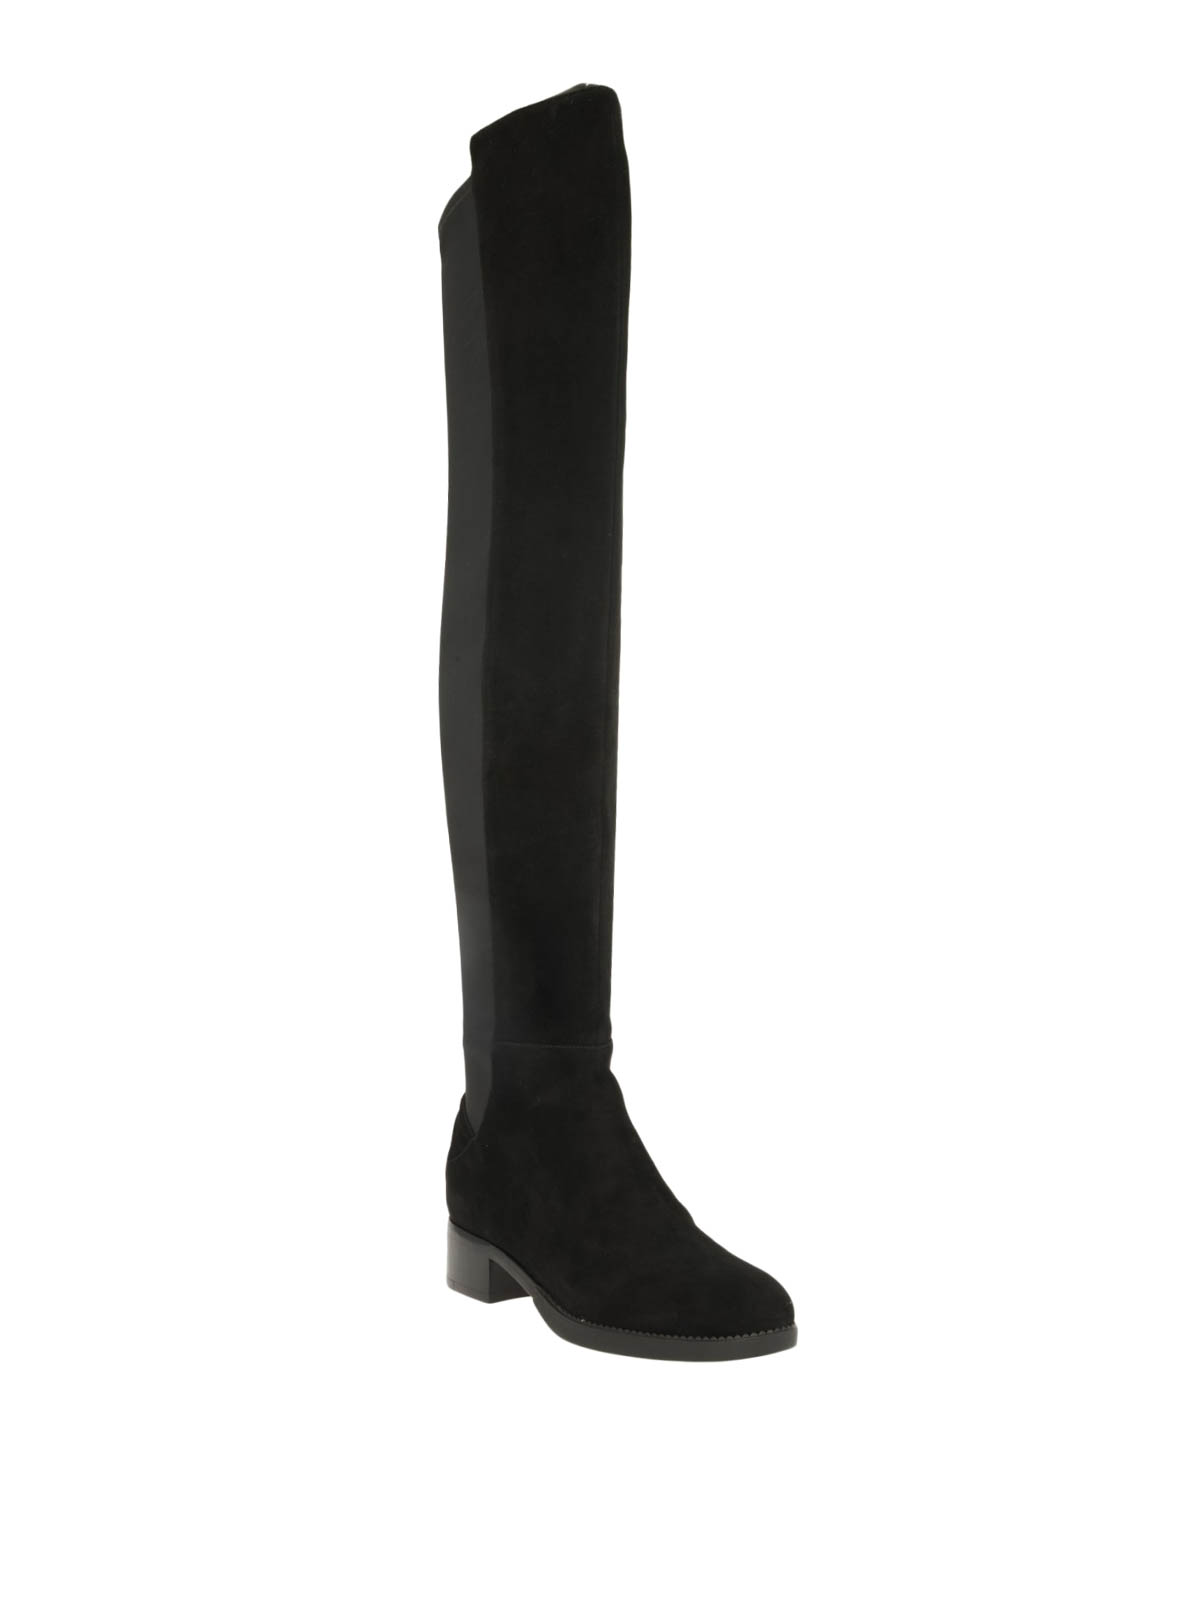 a9de17e8045 Tory Burch - Caitlin stretch over-the-knee boot - boots - 31444 001